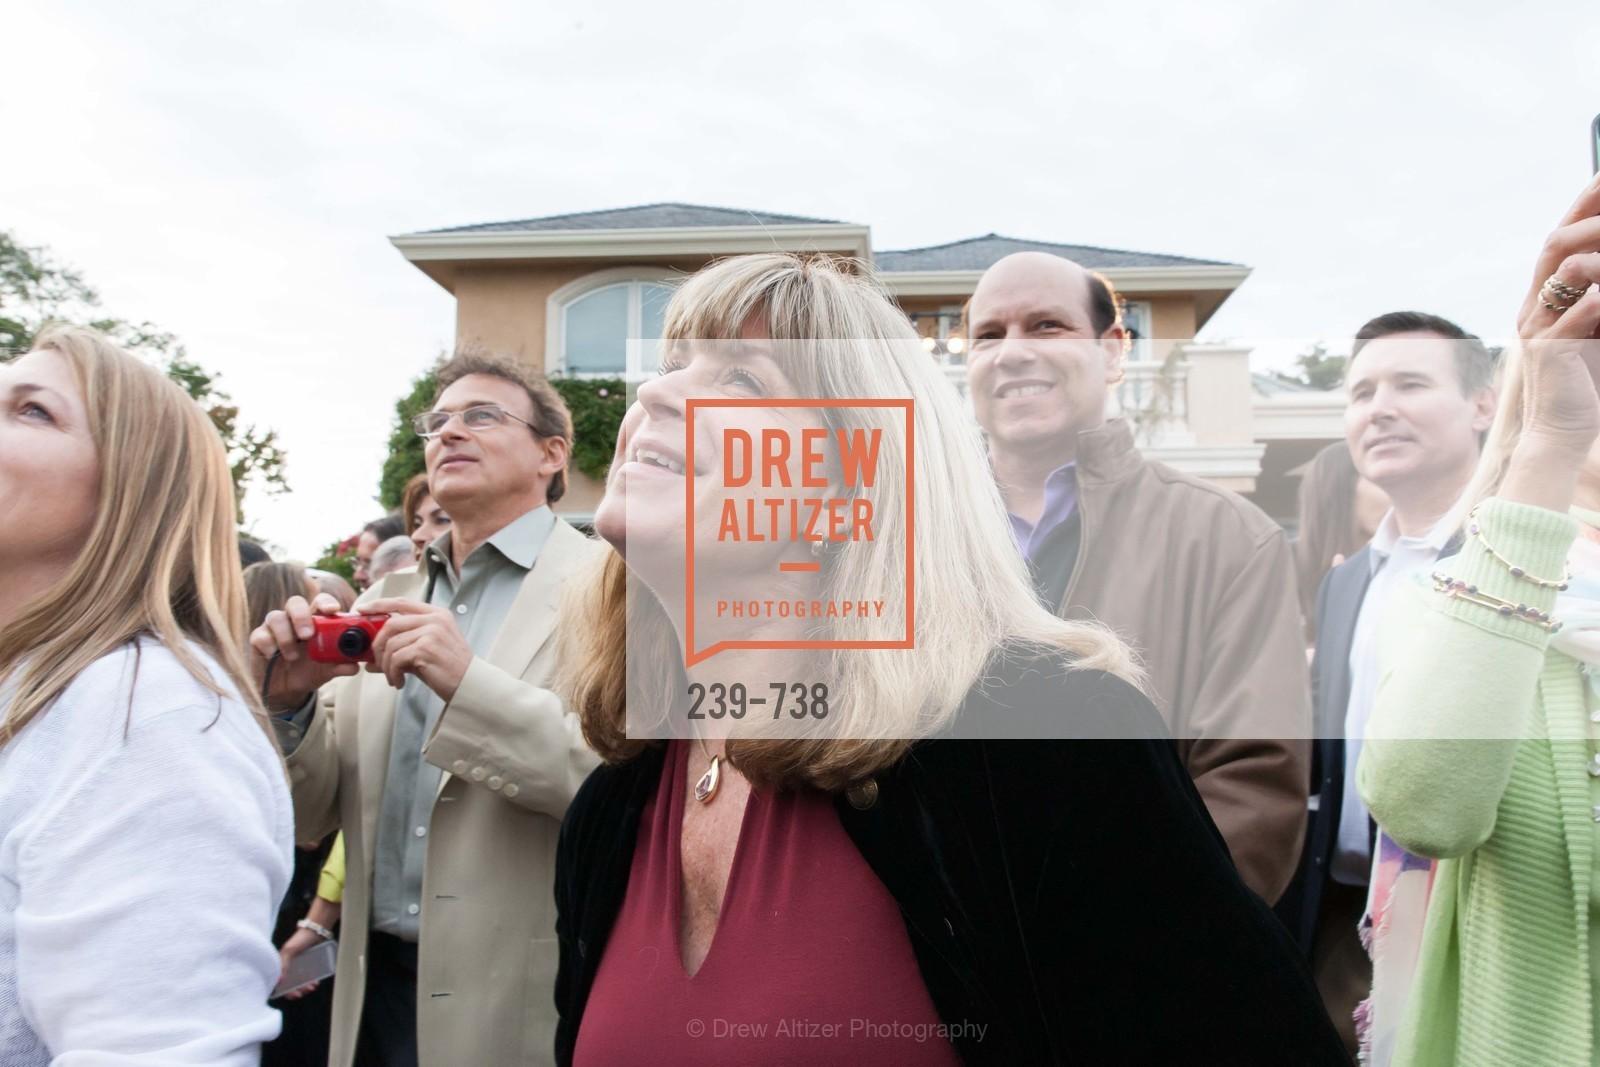 Carol Sontag, LymeAid 2015, US, May 18th, 2015,Drew Altizer, Drew Altizer Photography, full-service agency, private events, San Francisco photographer, photographer california